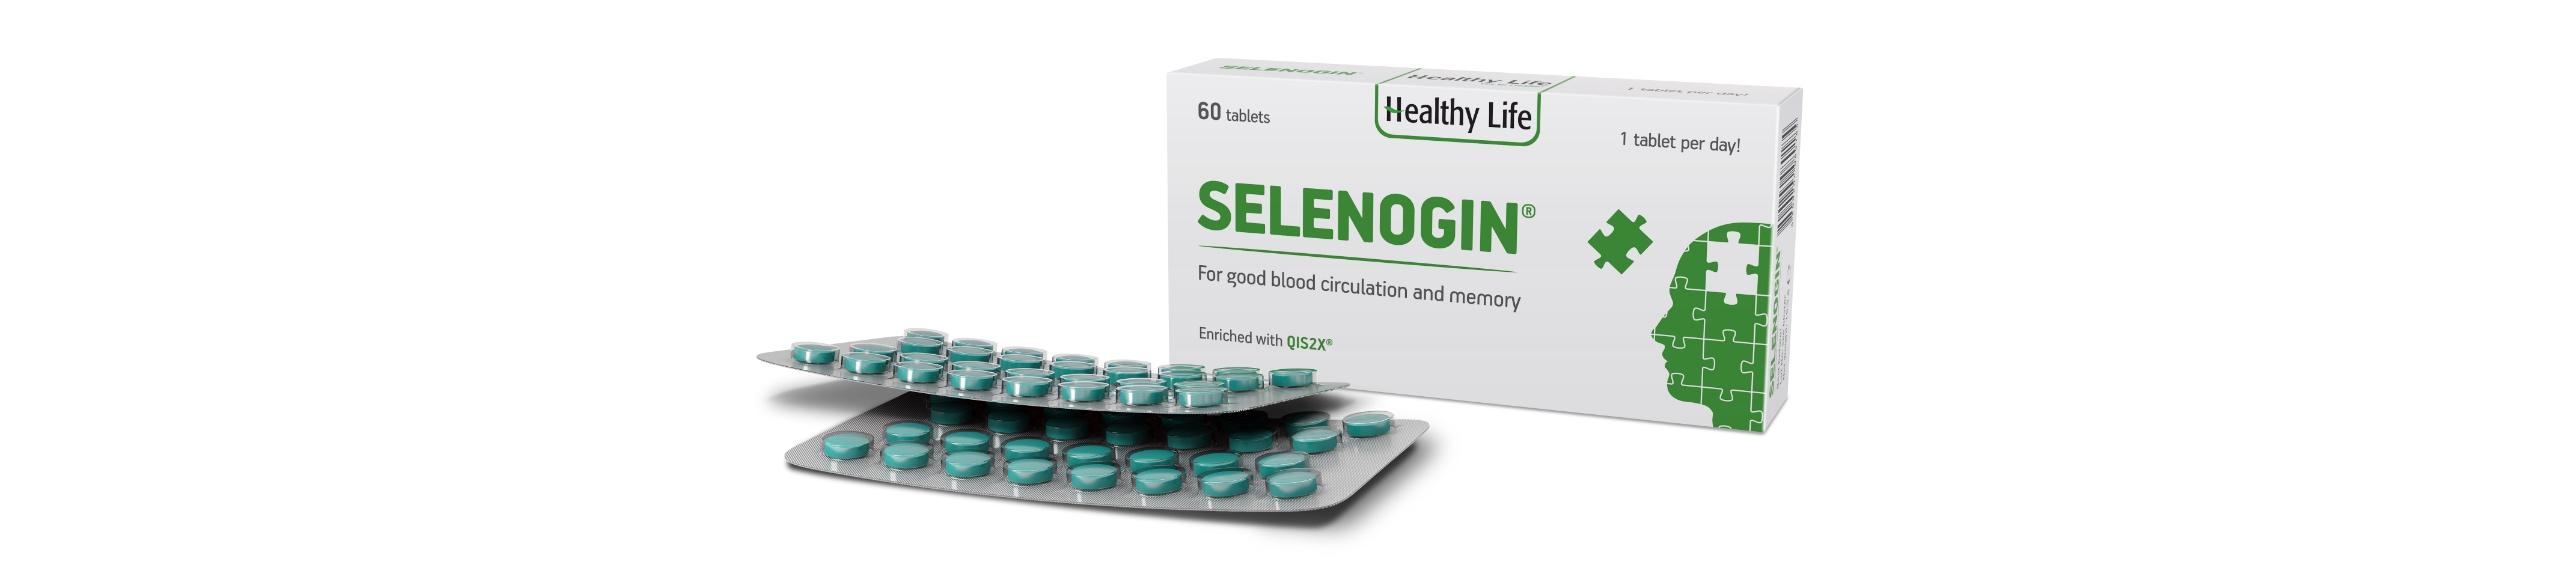 P3-Slider-img-Selenogin1